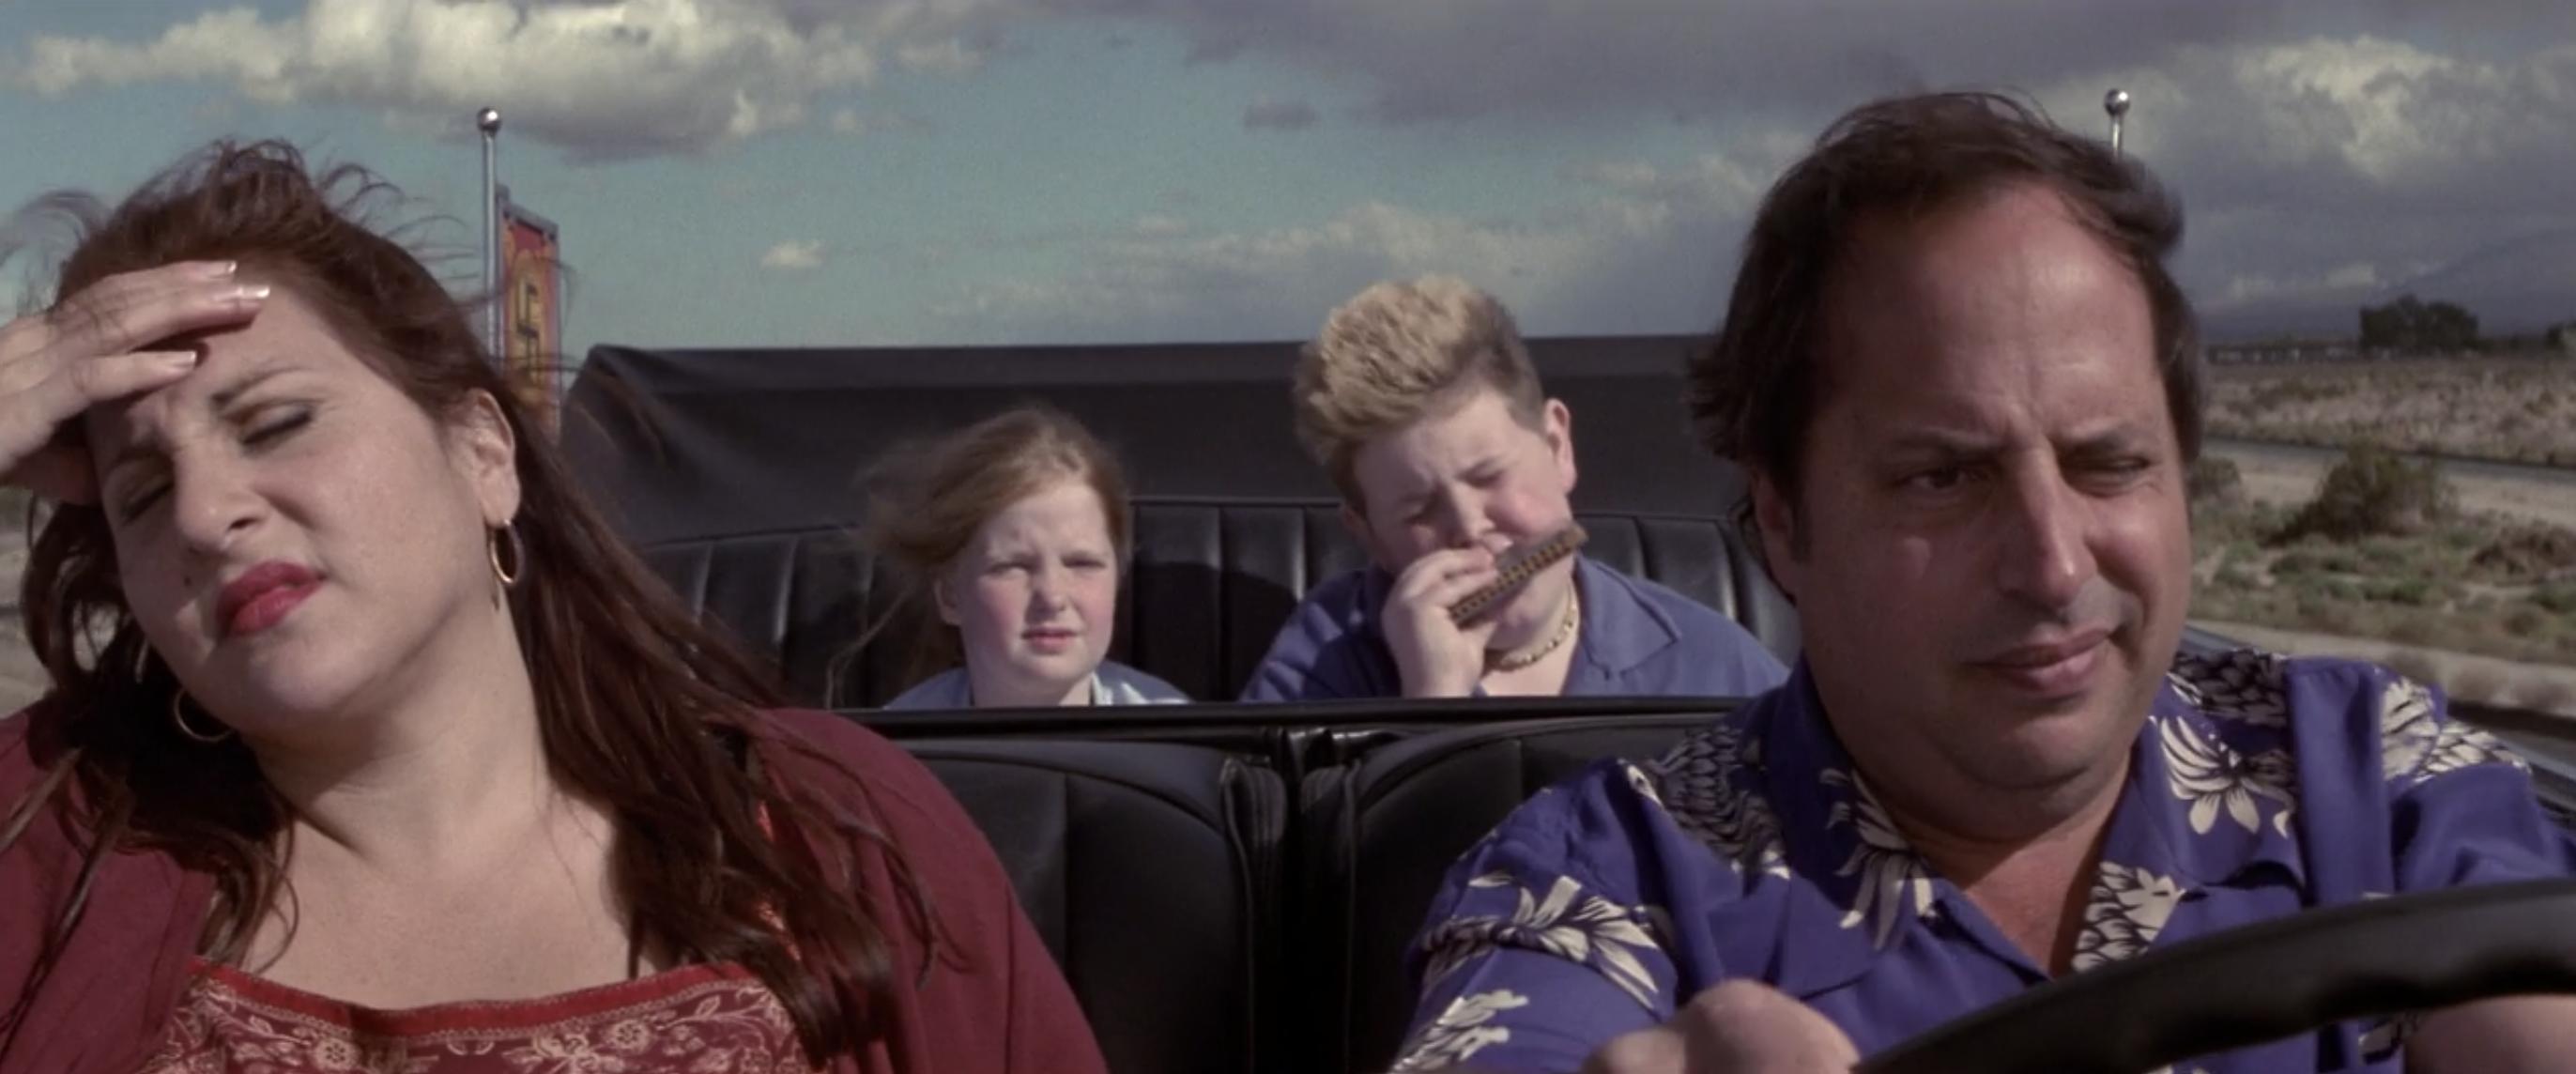 Kathy Najimy, Jon Lovitz, Jillian Marie Hubert, and Brody Smith sit in a convertible driving down a deserted road as Bev, Randy, Kimberly, and Jason